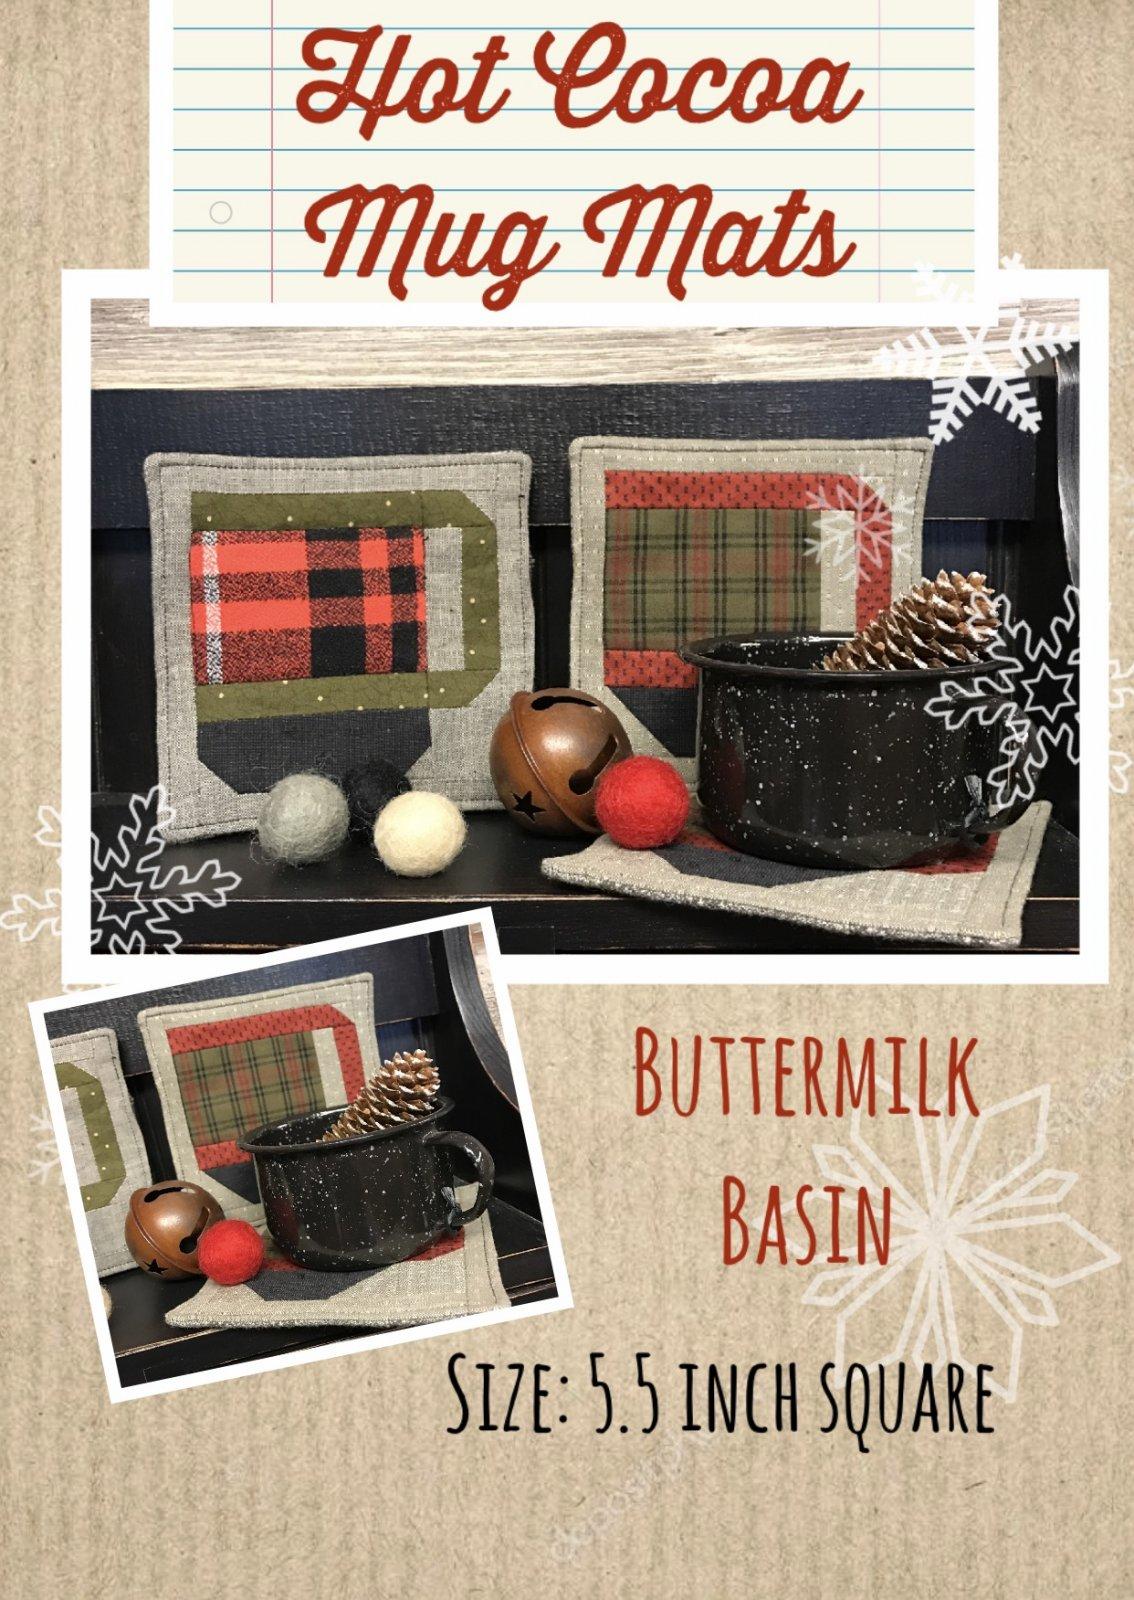 Hot Cocoa Mug Mats Pattern